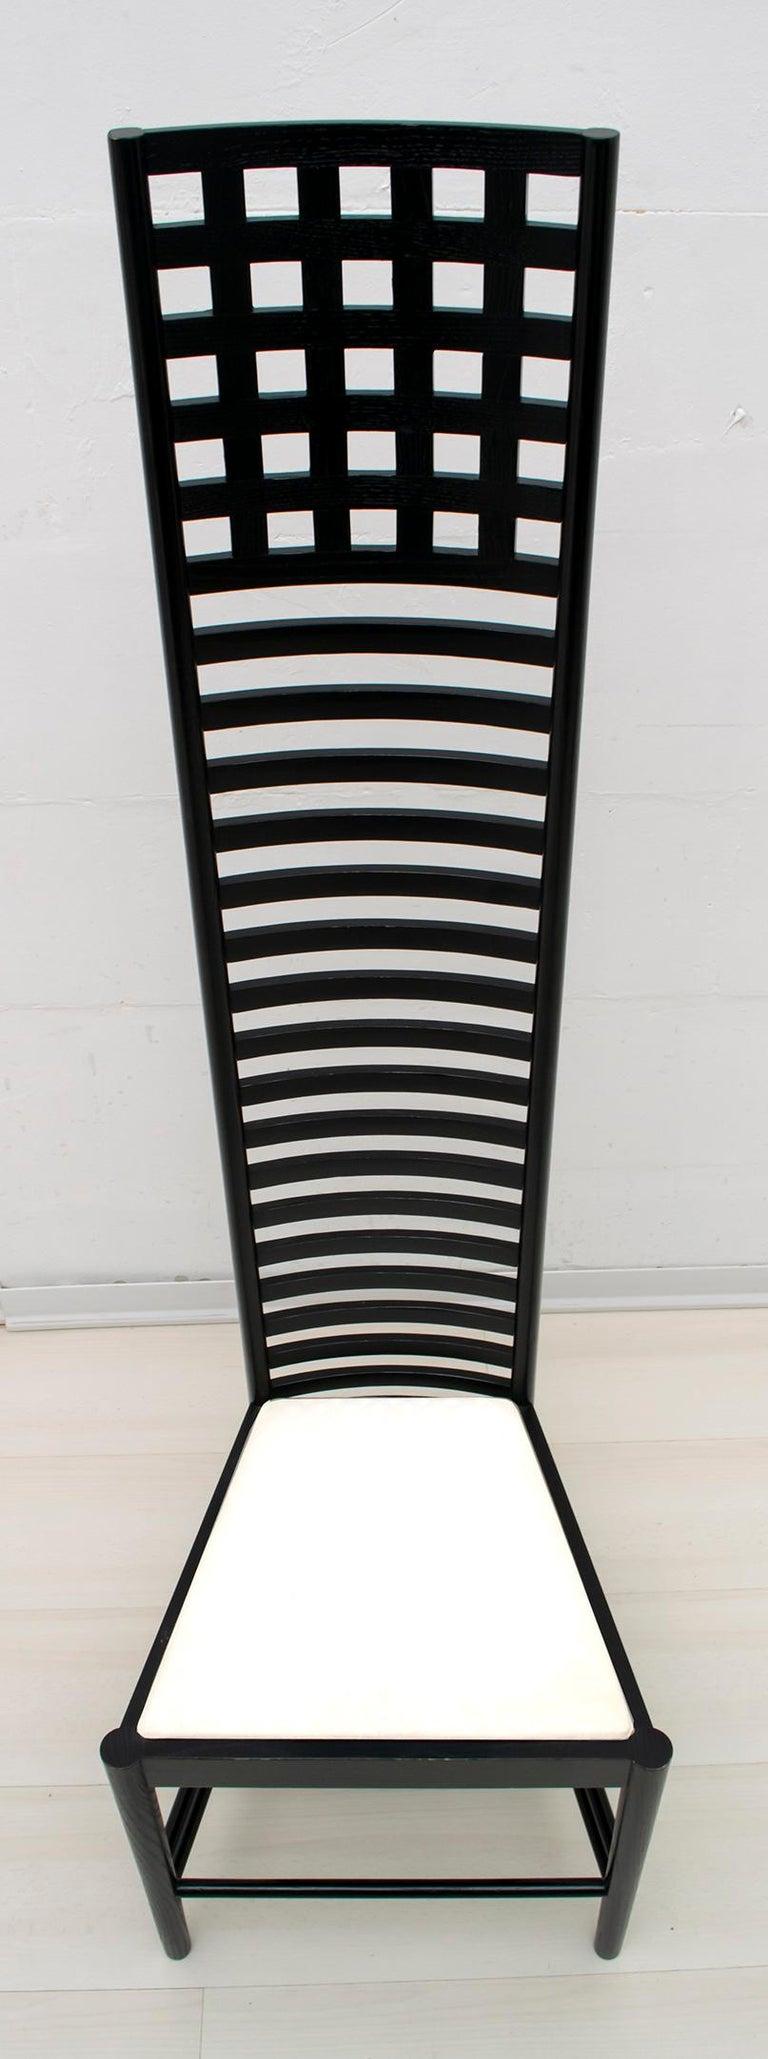 Italian Charles Rennie Mackintosh High Back Chairs